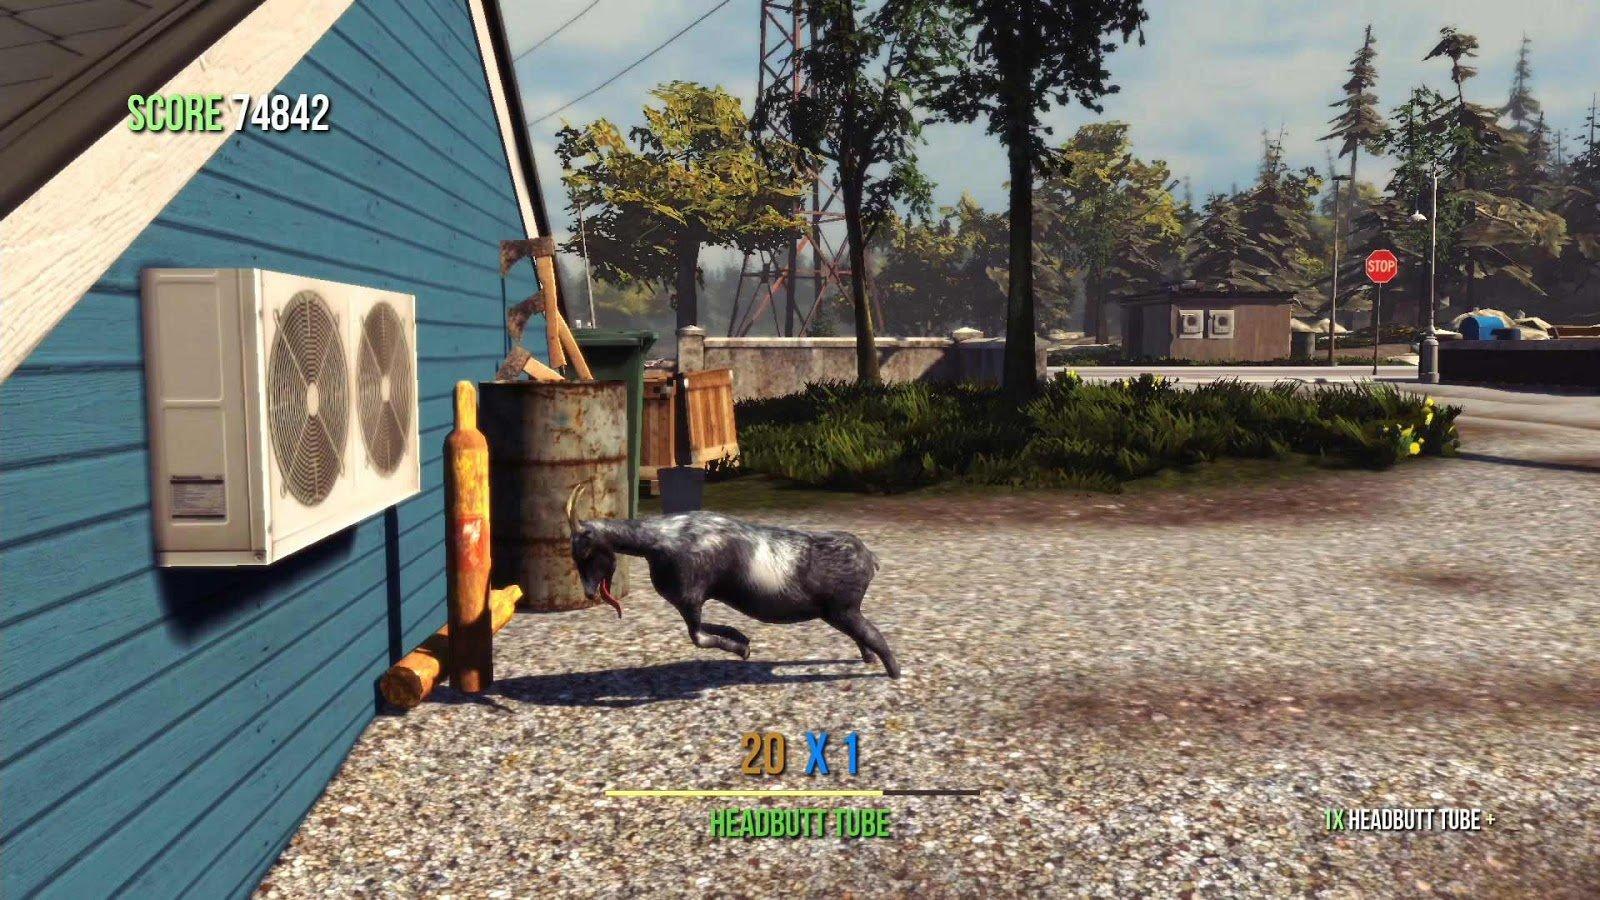 Goat Simulator Ps3 Playstation 3 Game Profile News